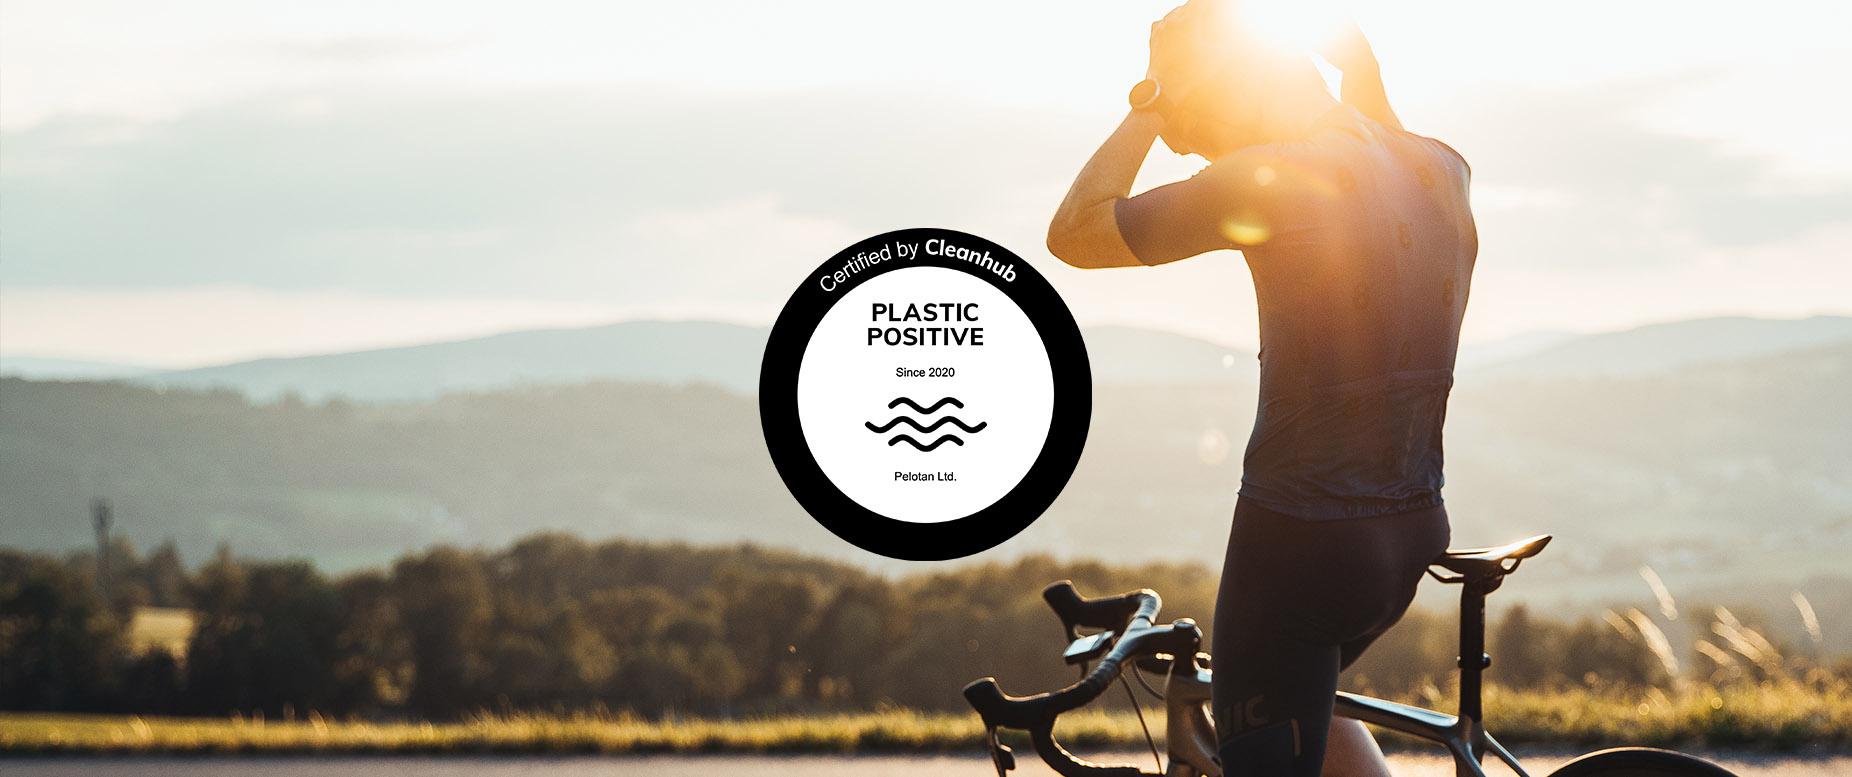 plastic positive Pelotan